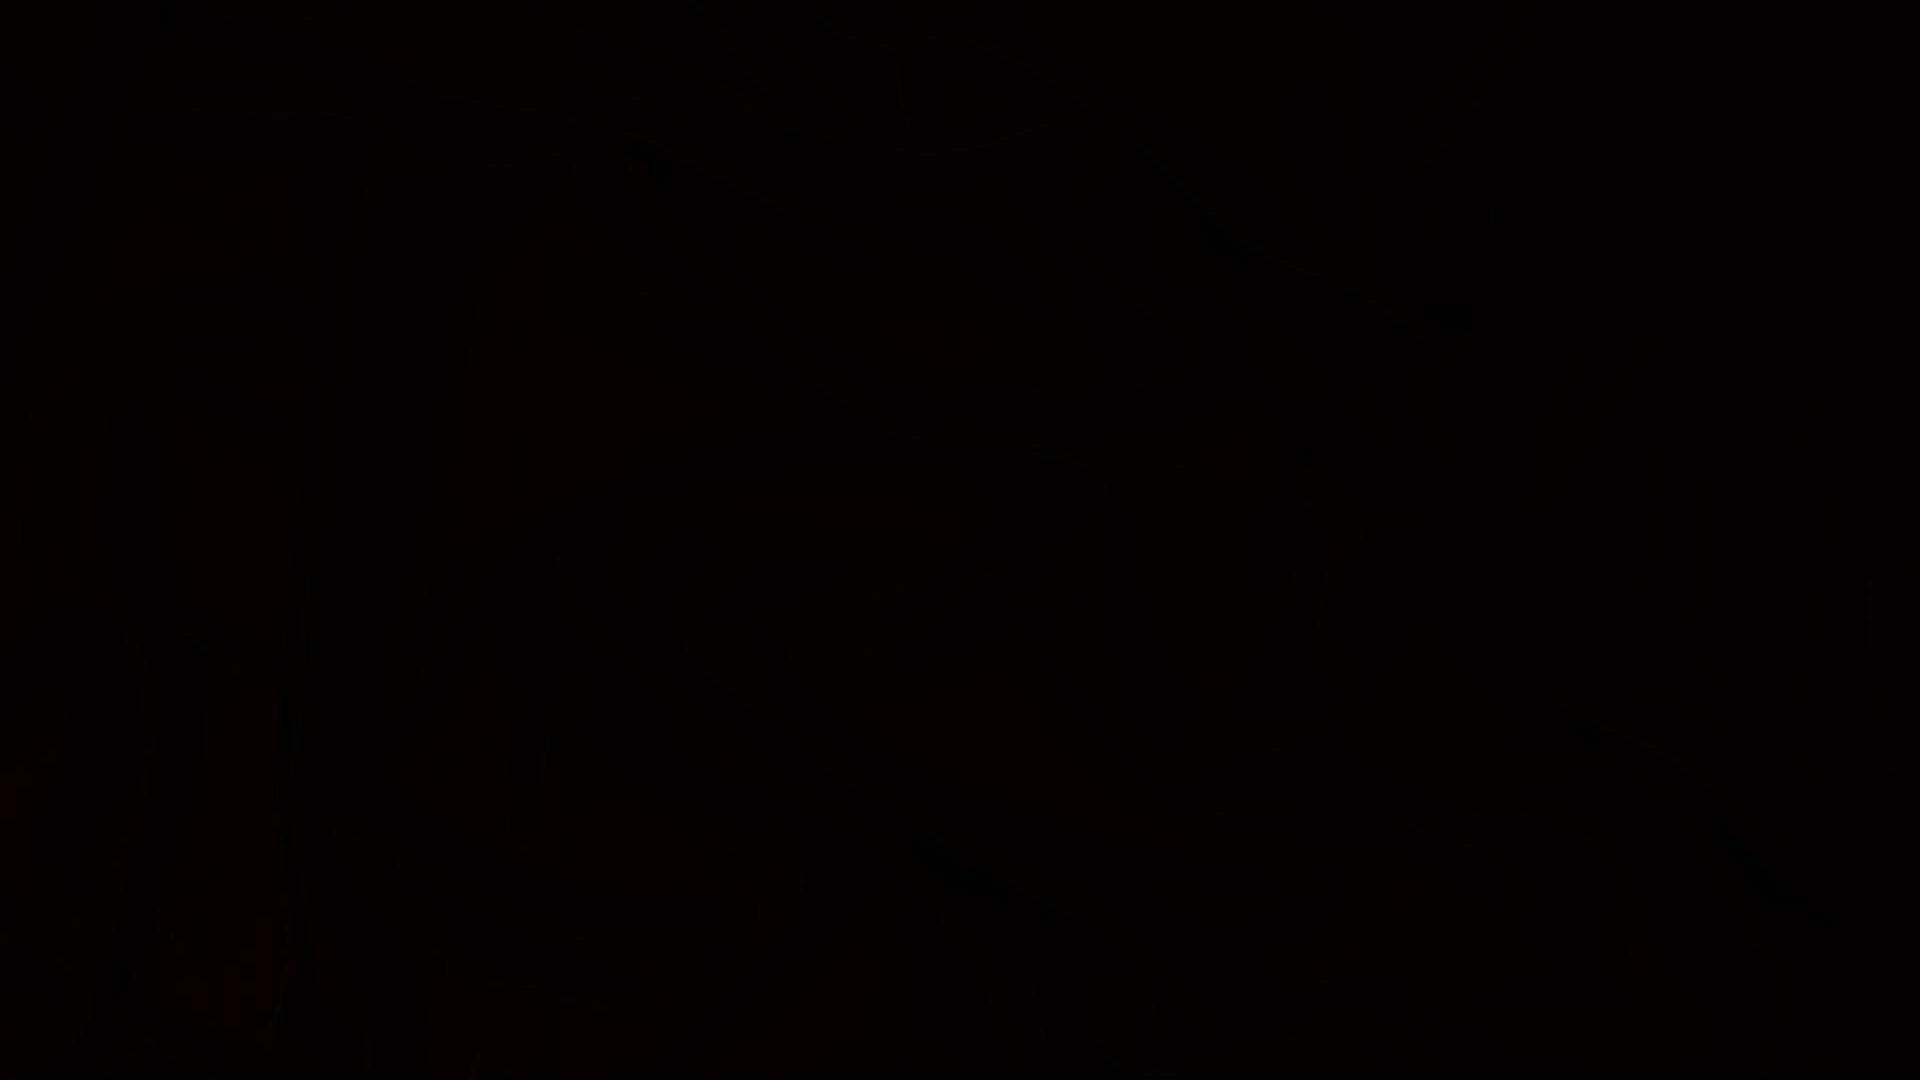 Black Wallpaper 1080p Wallpapertag